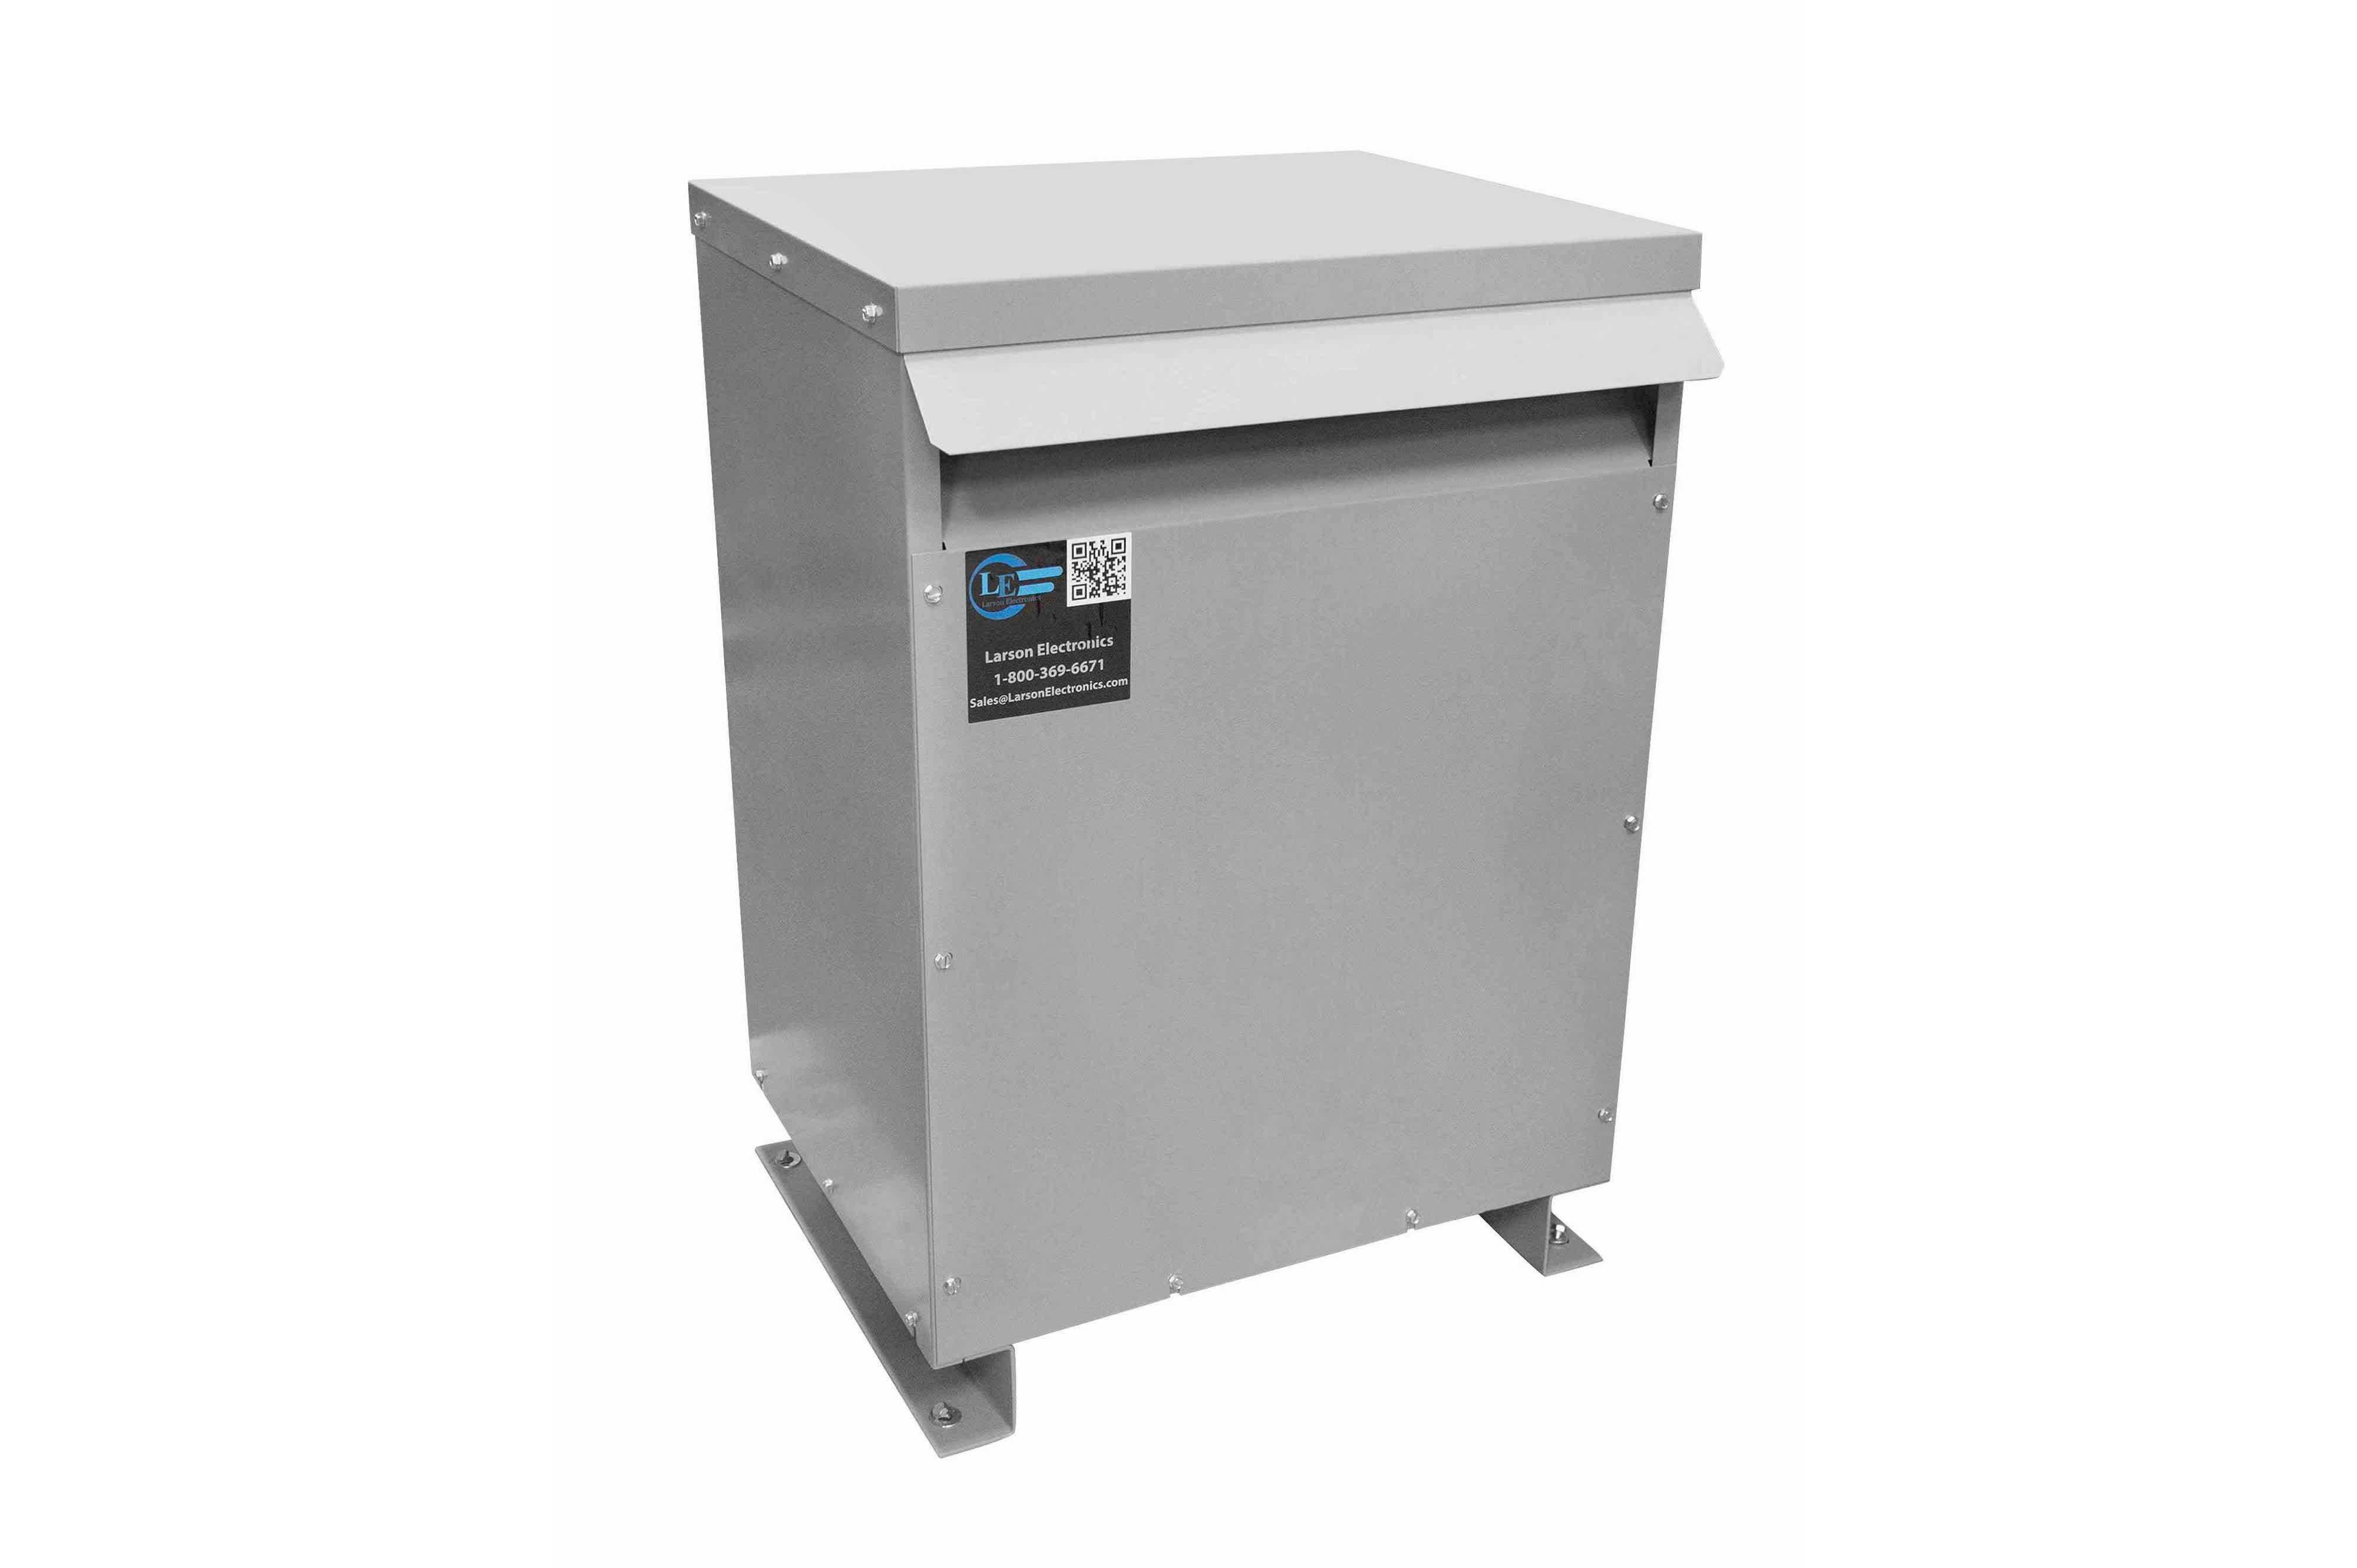 250 kVA 3PH Isolation Transformer, 208V Wye Primary, 208Y/120 Wye-N Secondary, N3R, Ventilated, 60 Hz